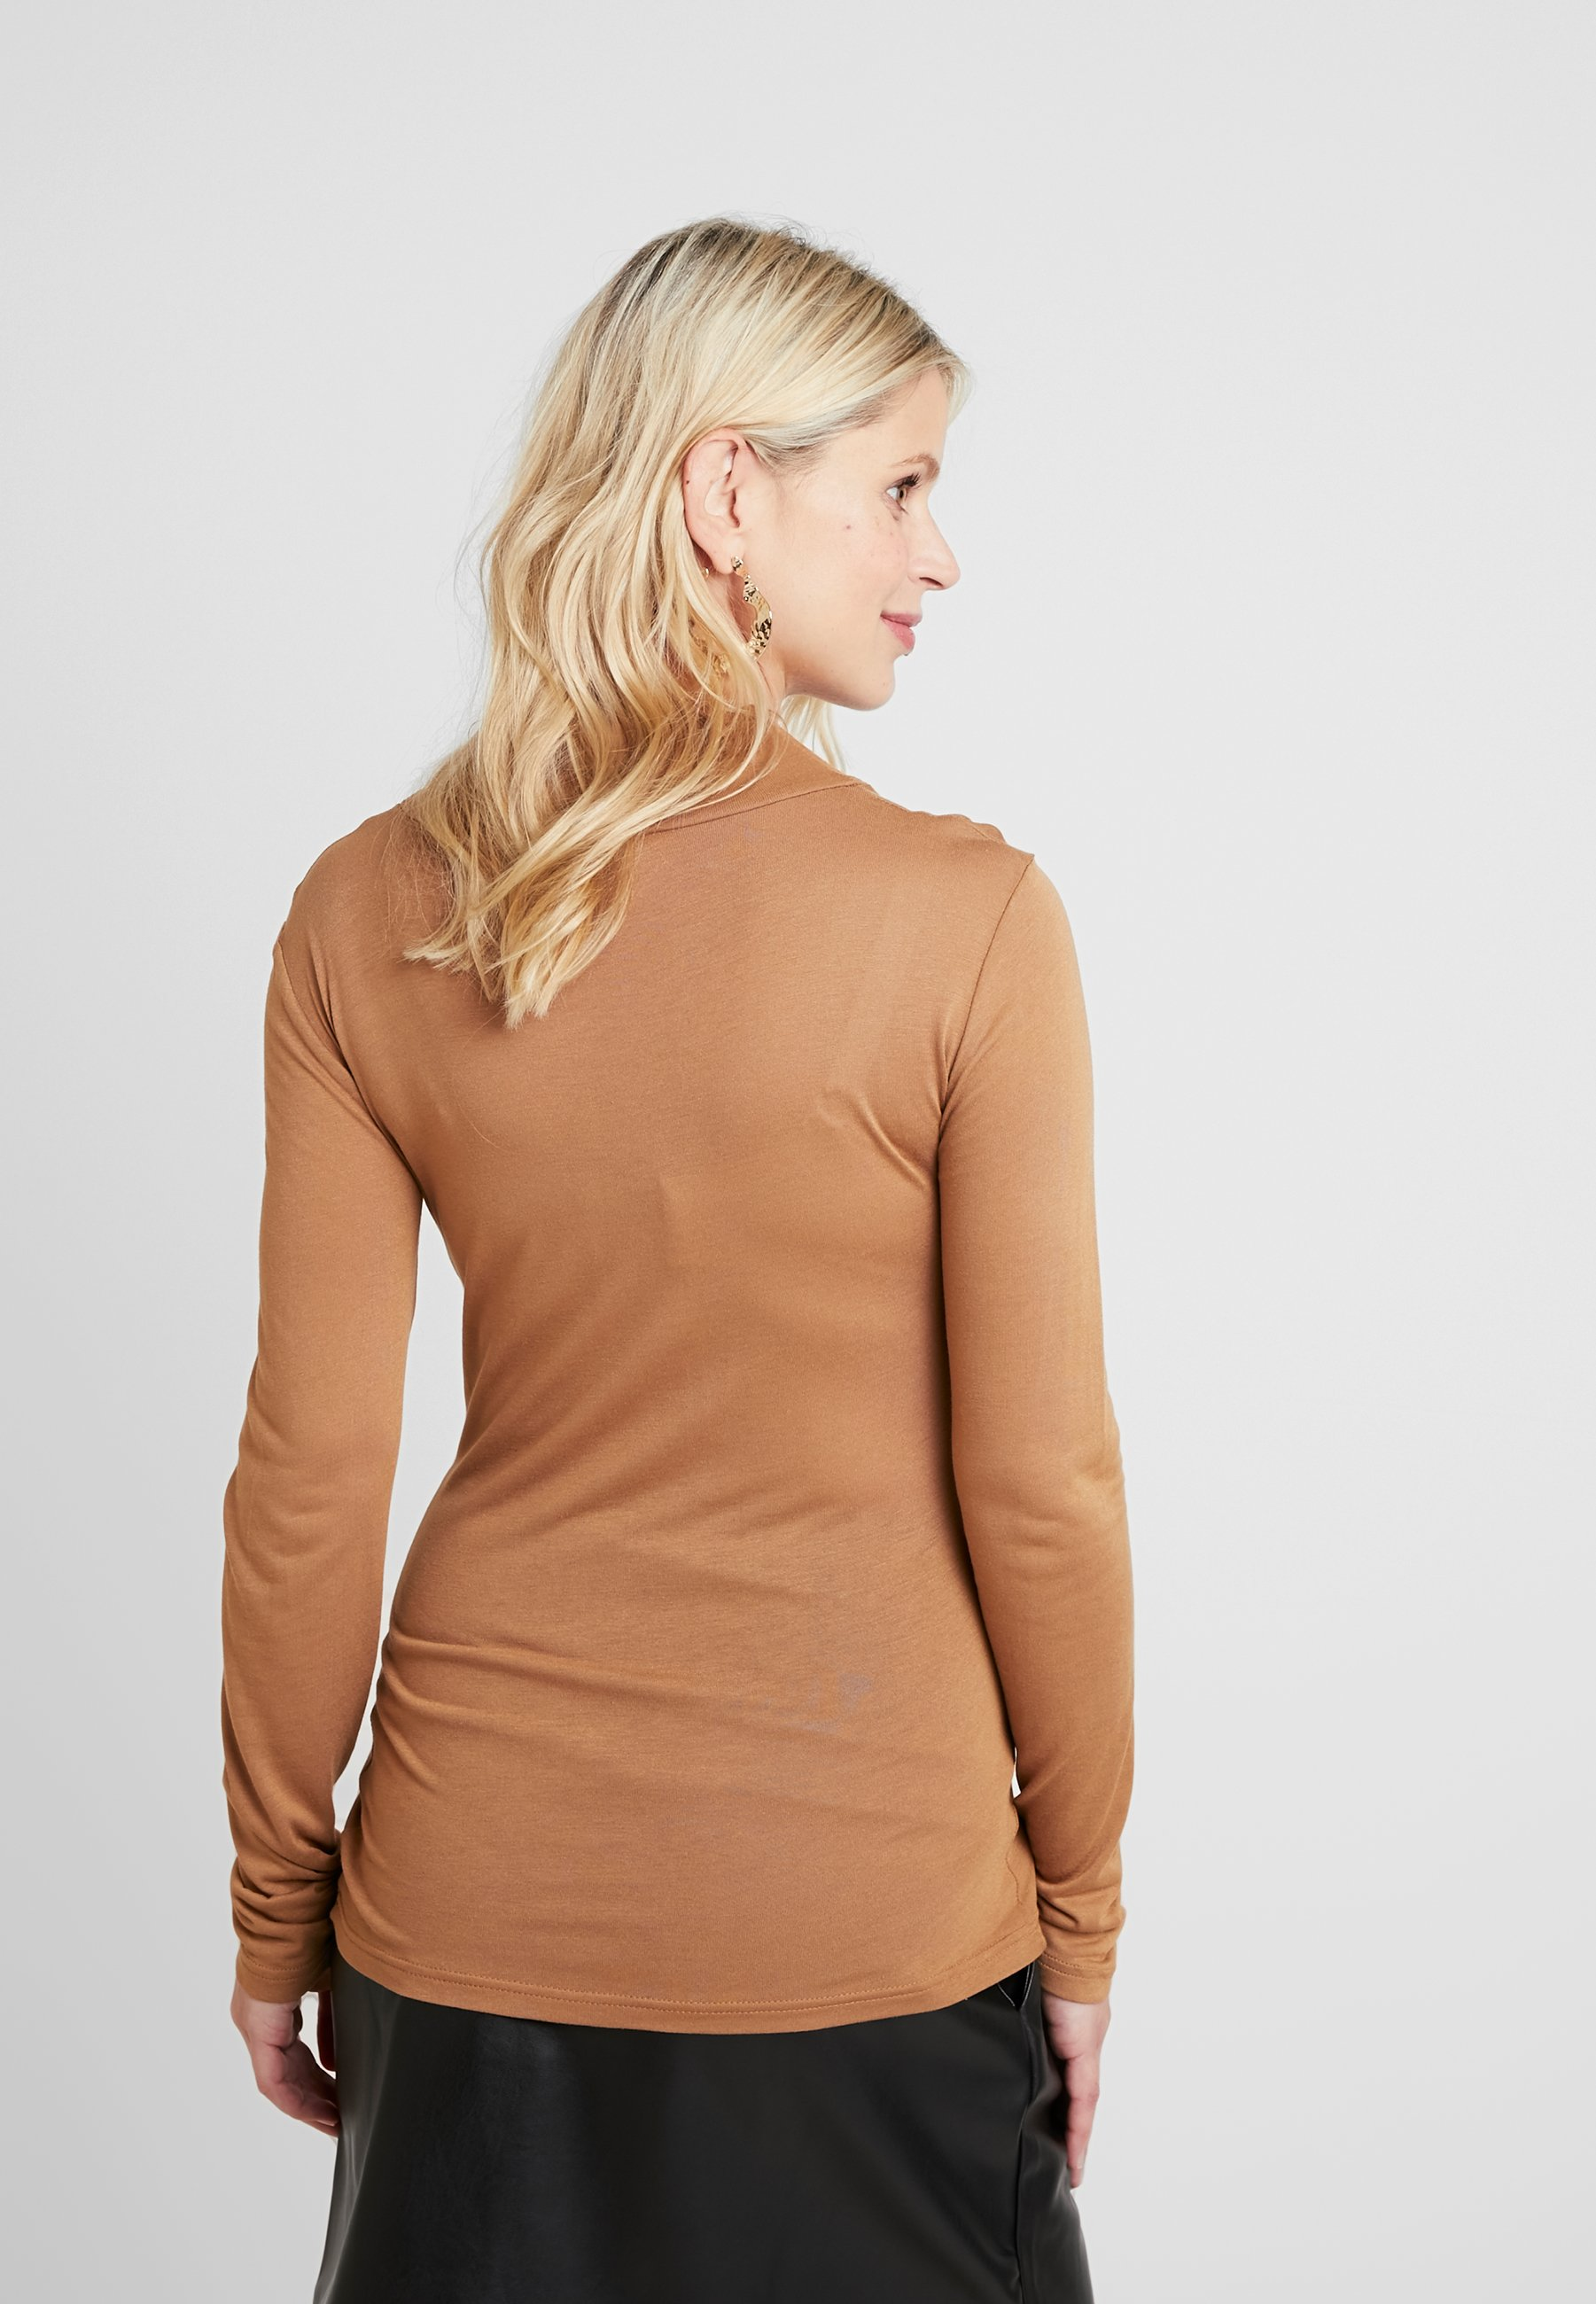 Janz Sand À Manches SleeveT Paula shirt Maternity Long Longues nOPk0w